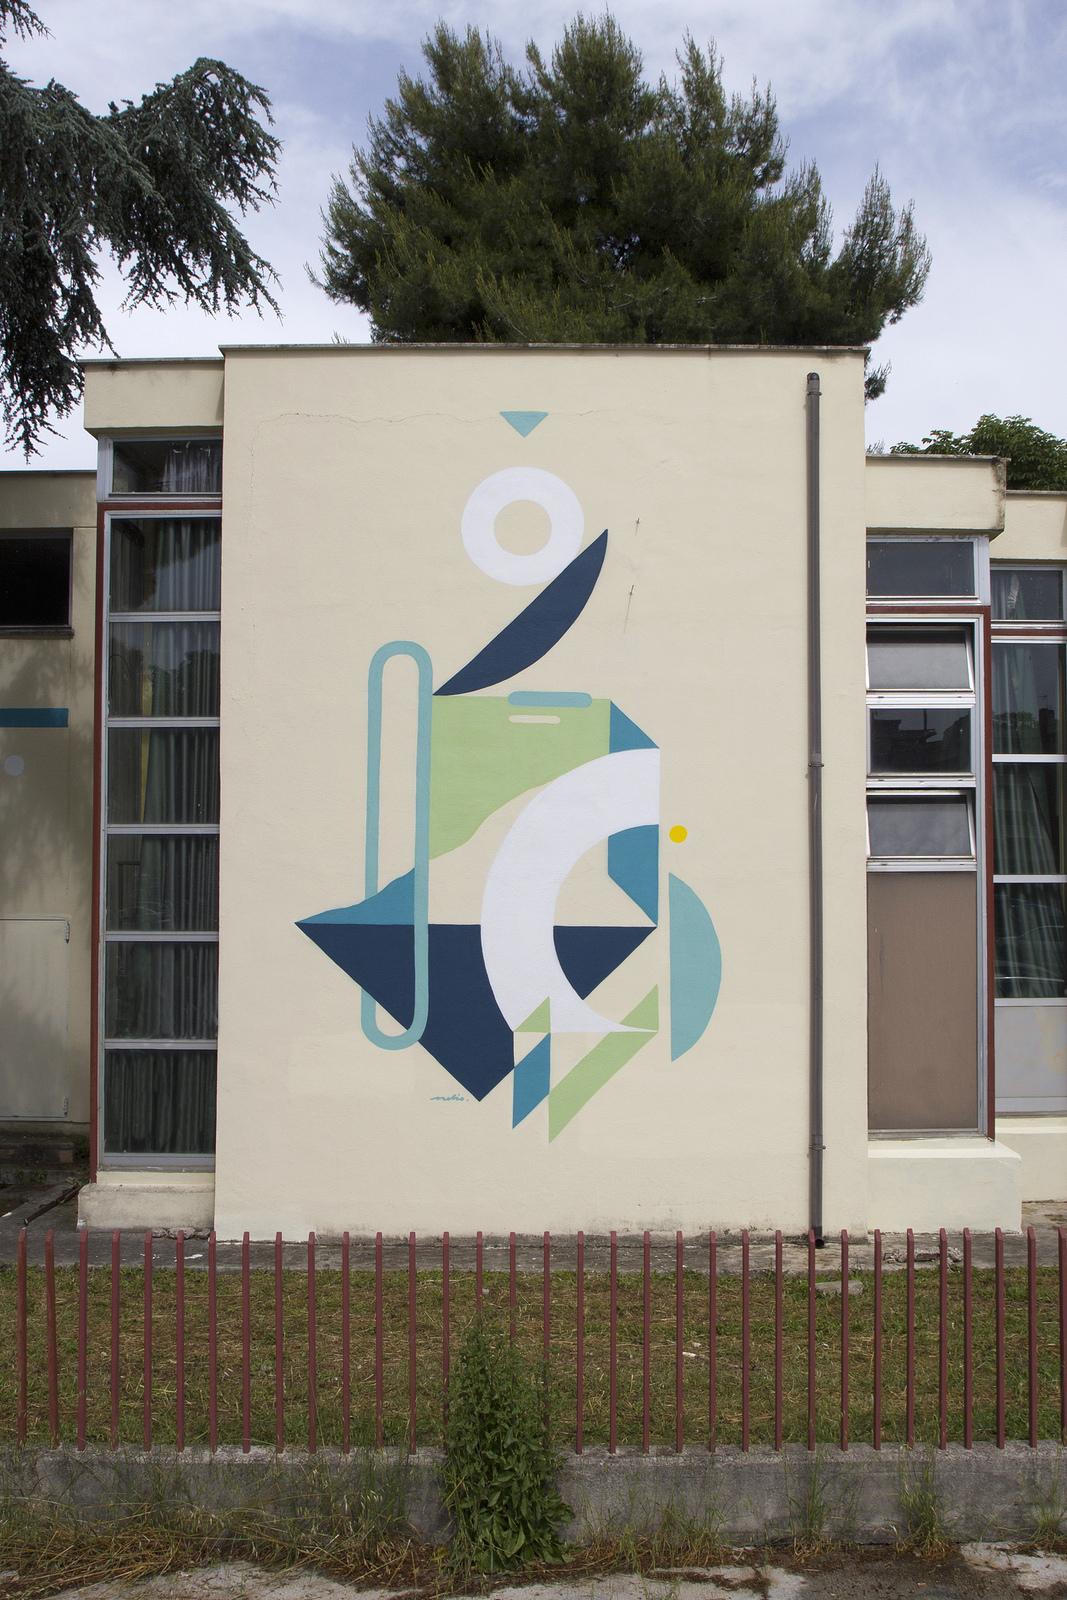 nelio-new-murals-for-memorie-urbane-festival-2014-02